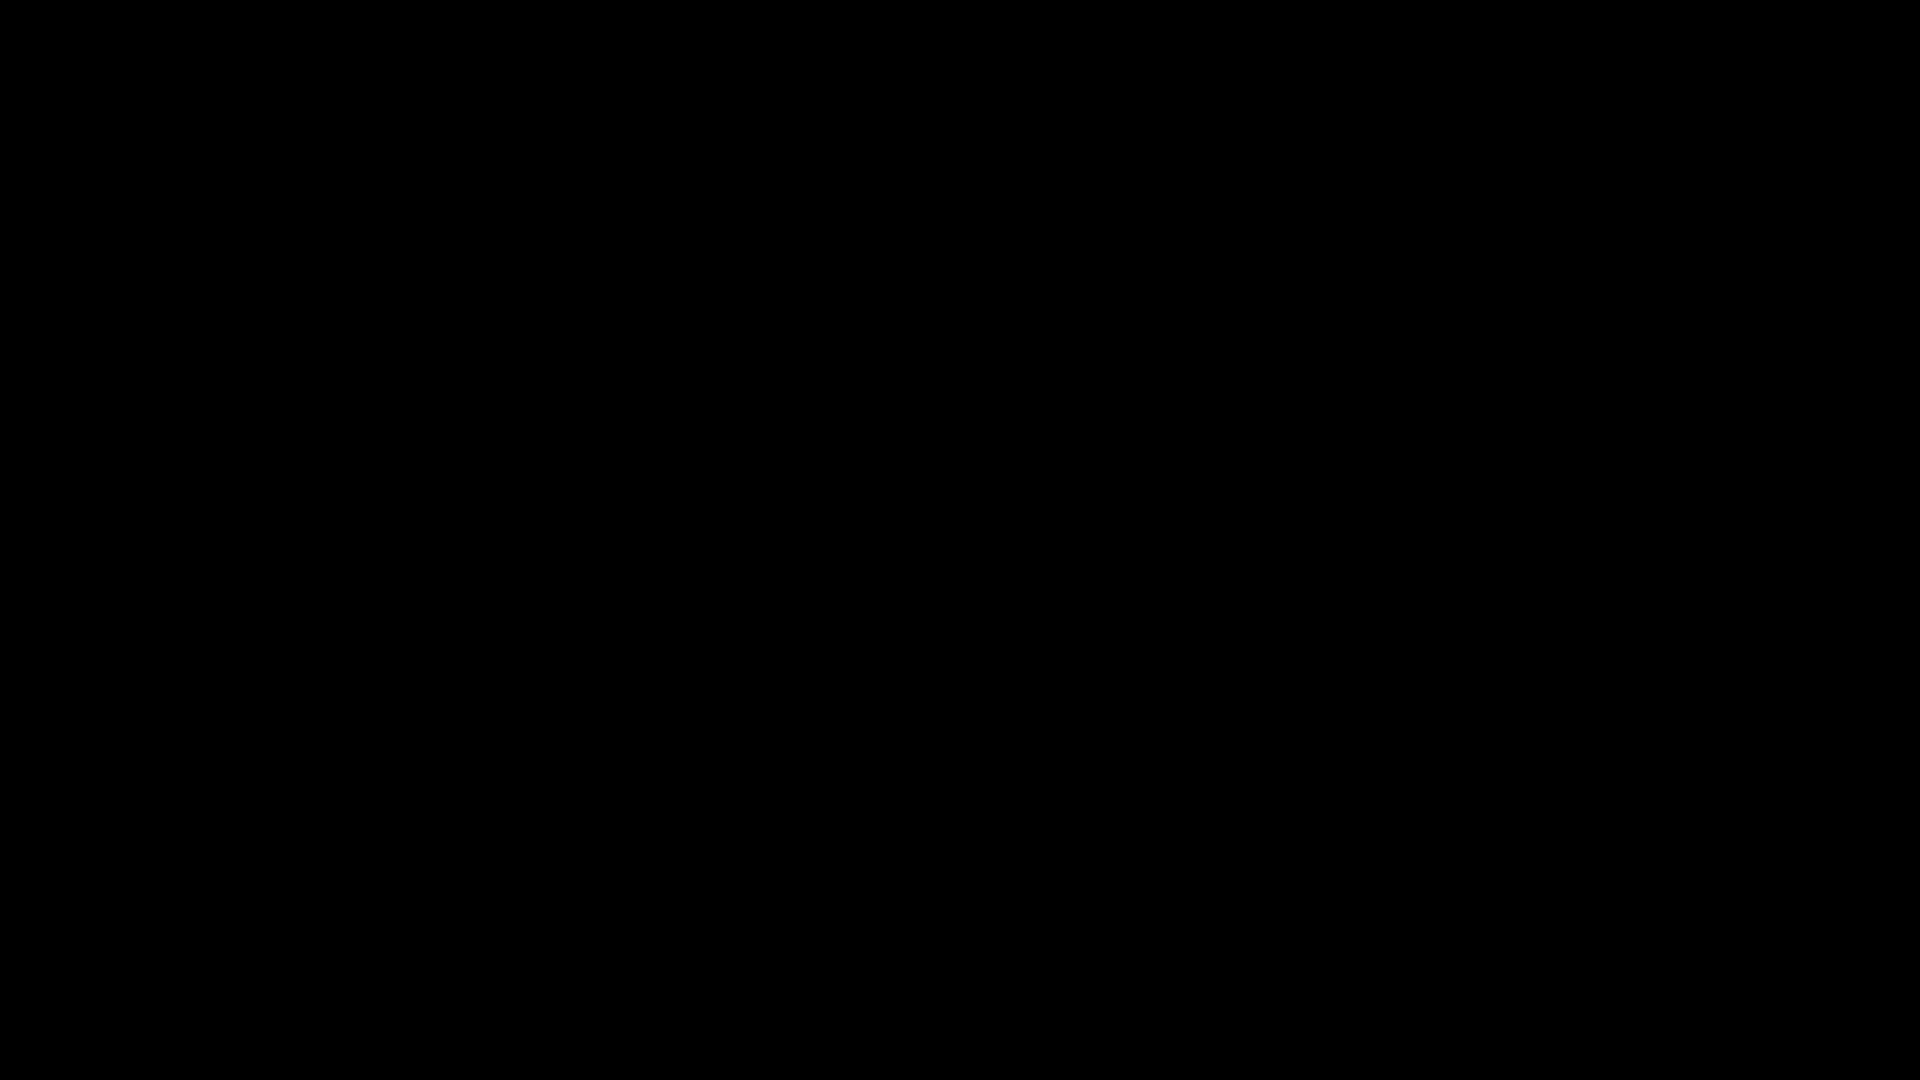 CHCIW Synthesis Sodium Salt 5-Sulphonatoisophthalate CAS:107-21-1 Ethylene Glycol